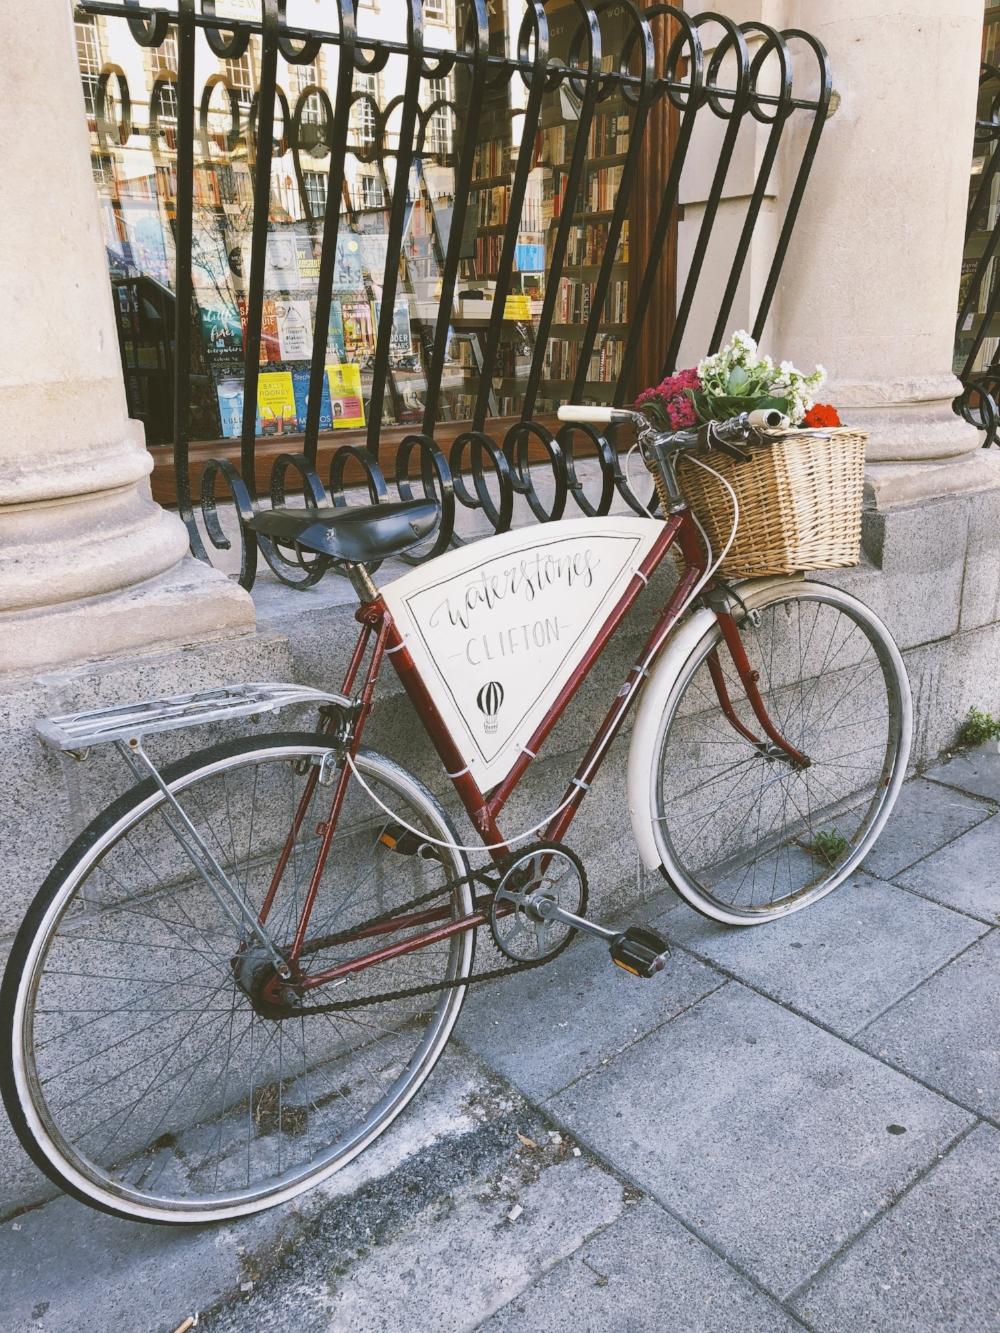 A bike outside Waterstones Book store.